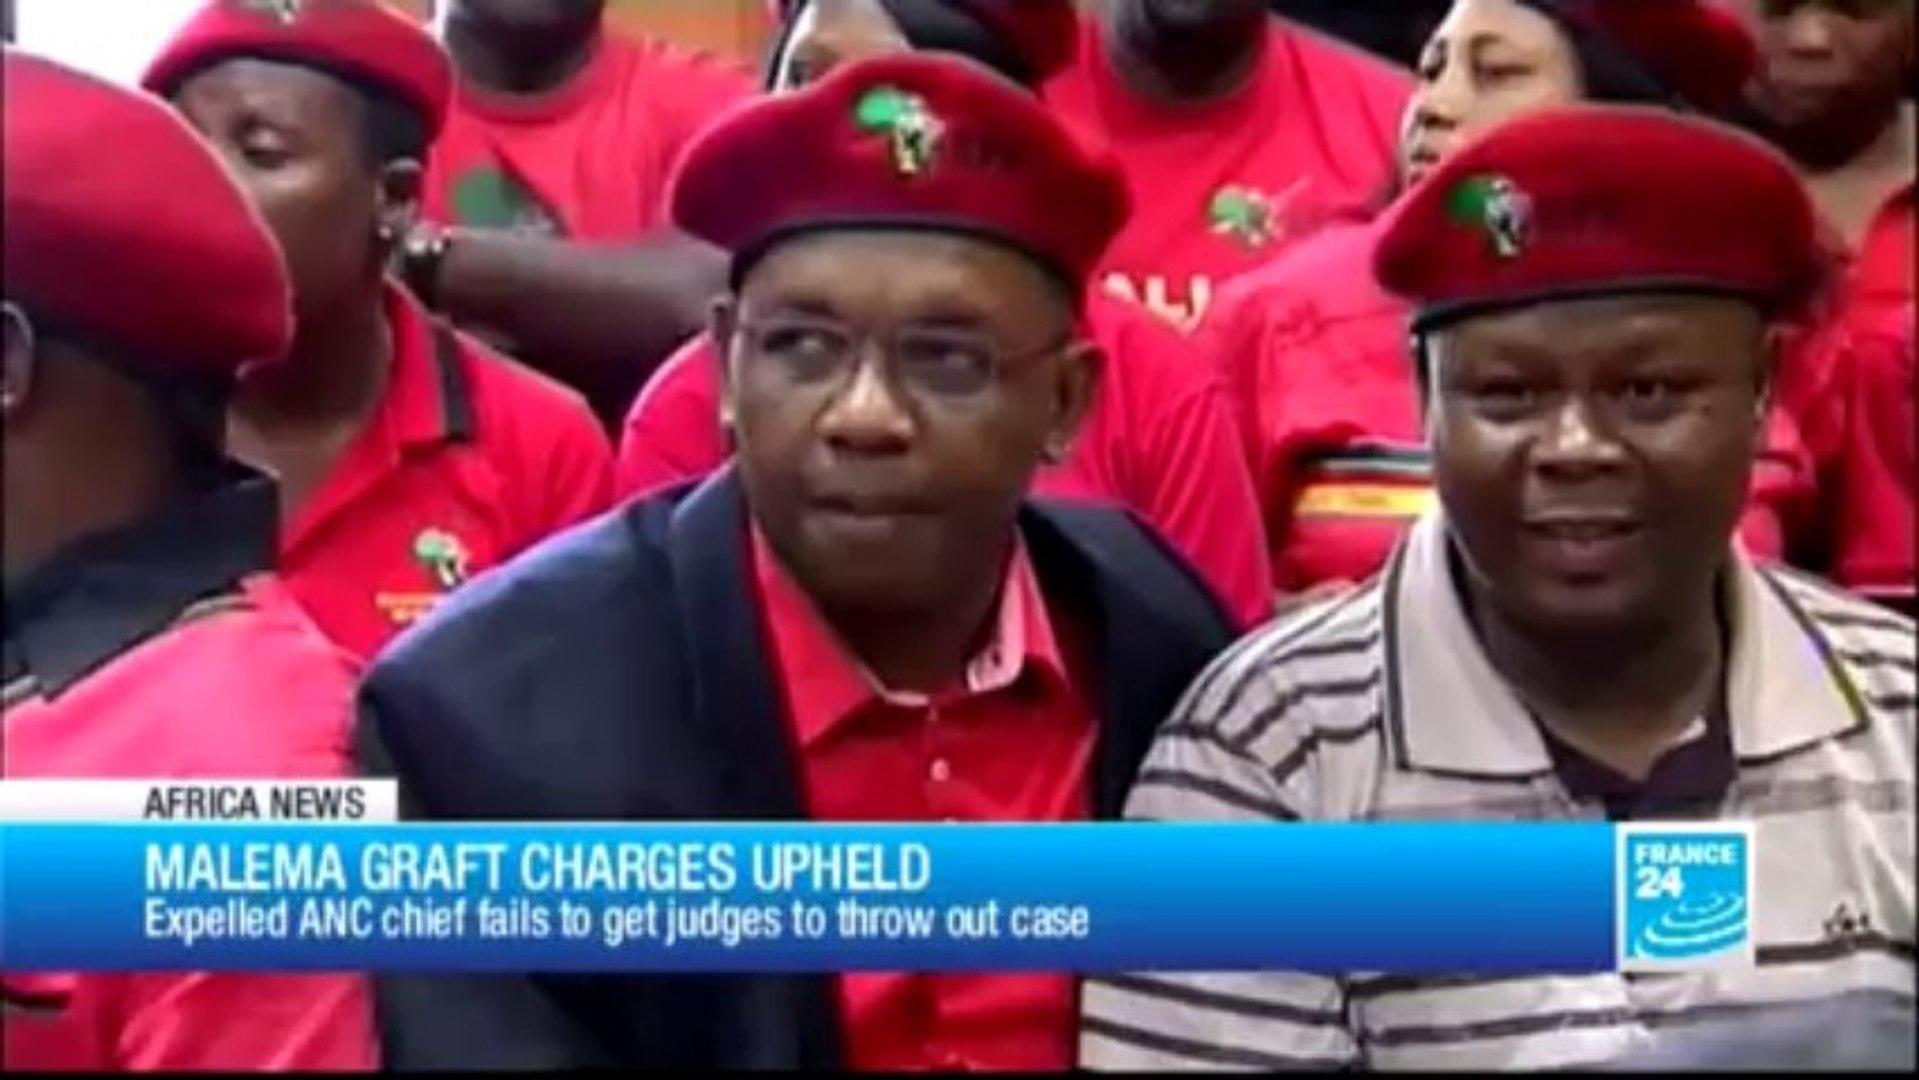 AFRICA NEWS - Good news for Kenya as ICC members change rules